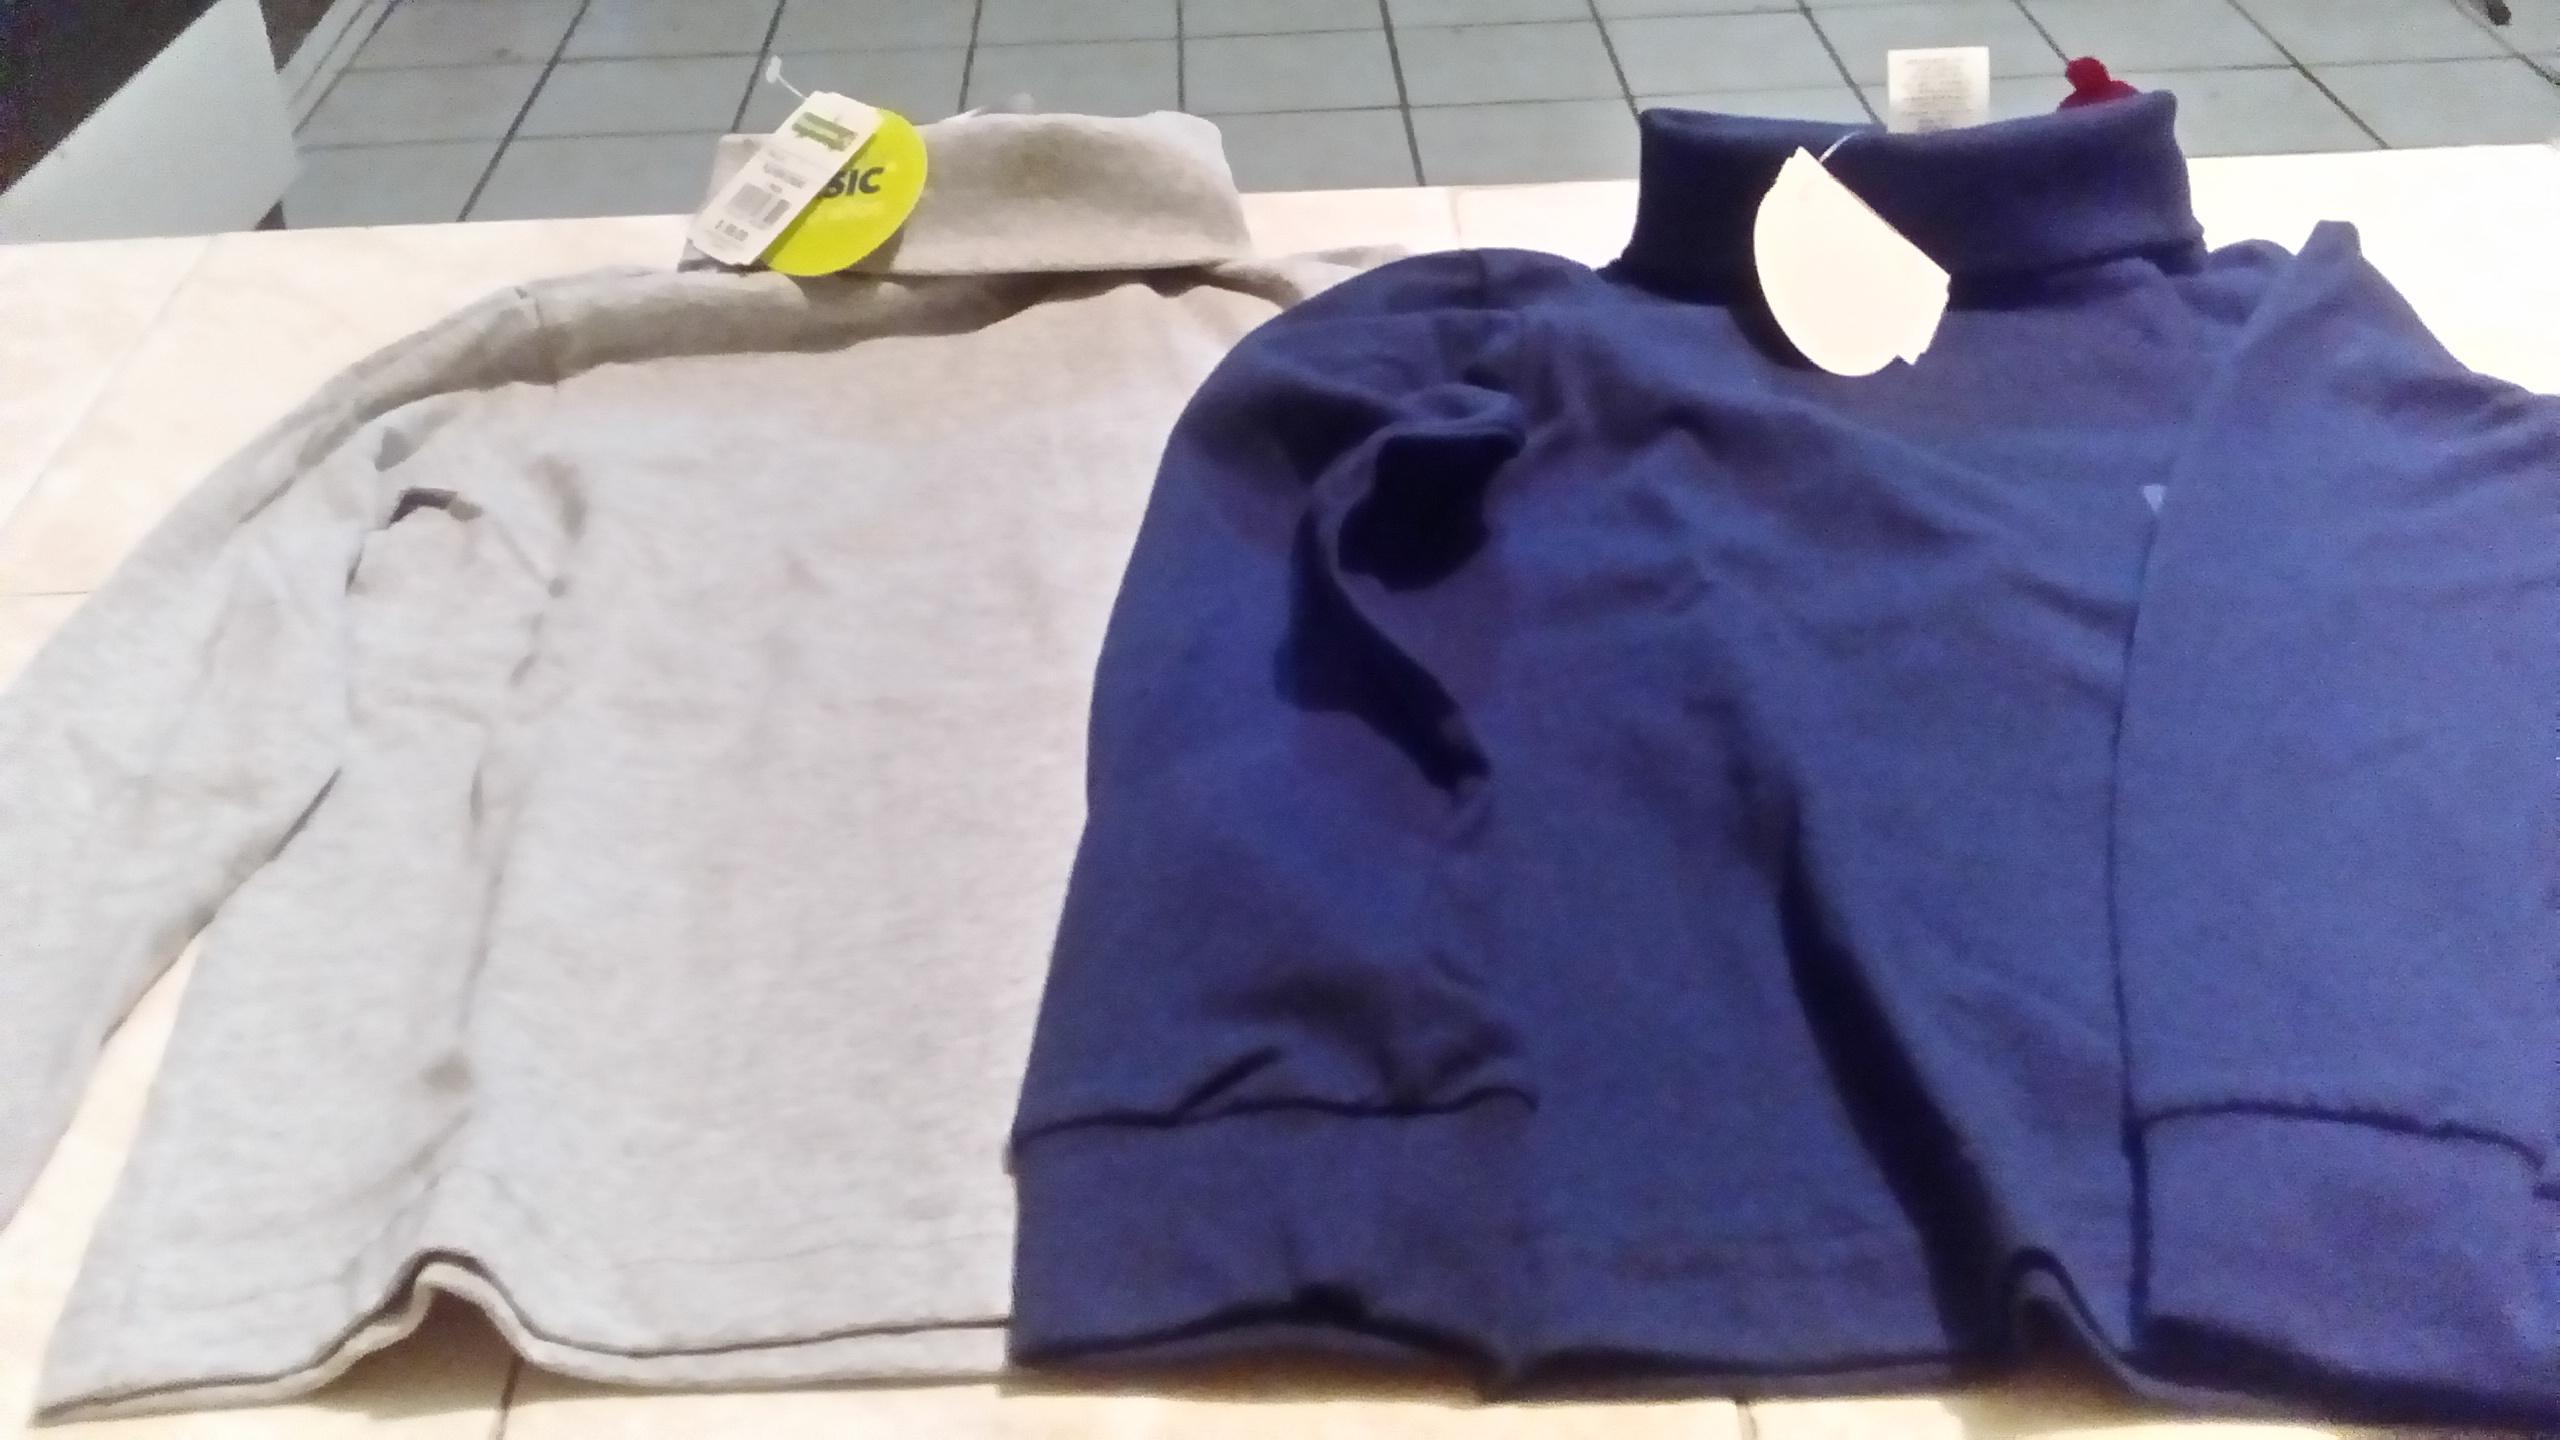 Bodega Aurrerá: Camisa para niño cuello largo azul o gris a $10.02